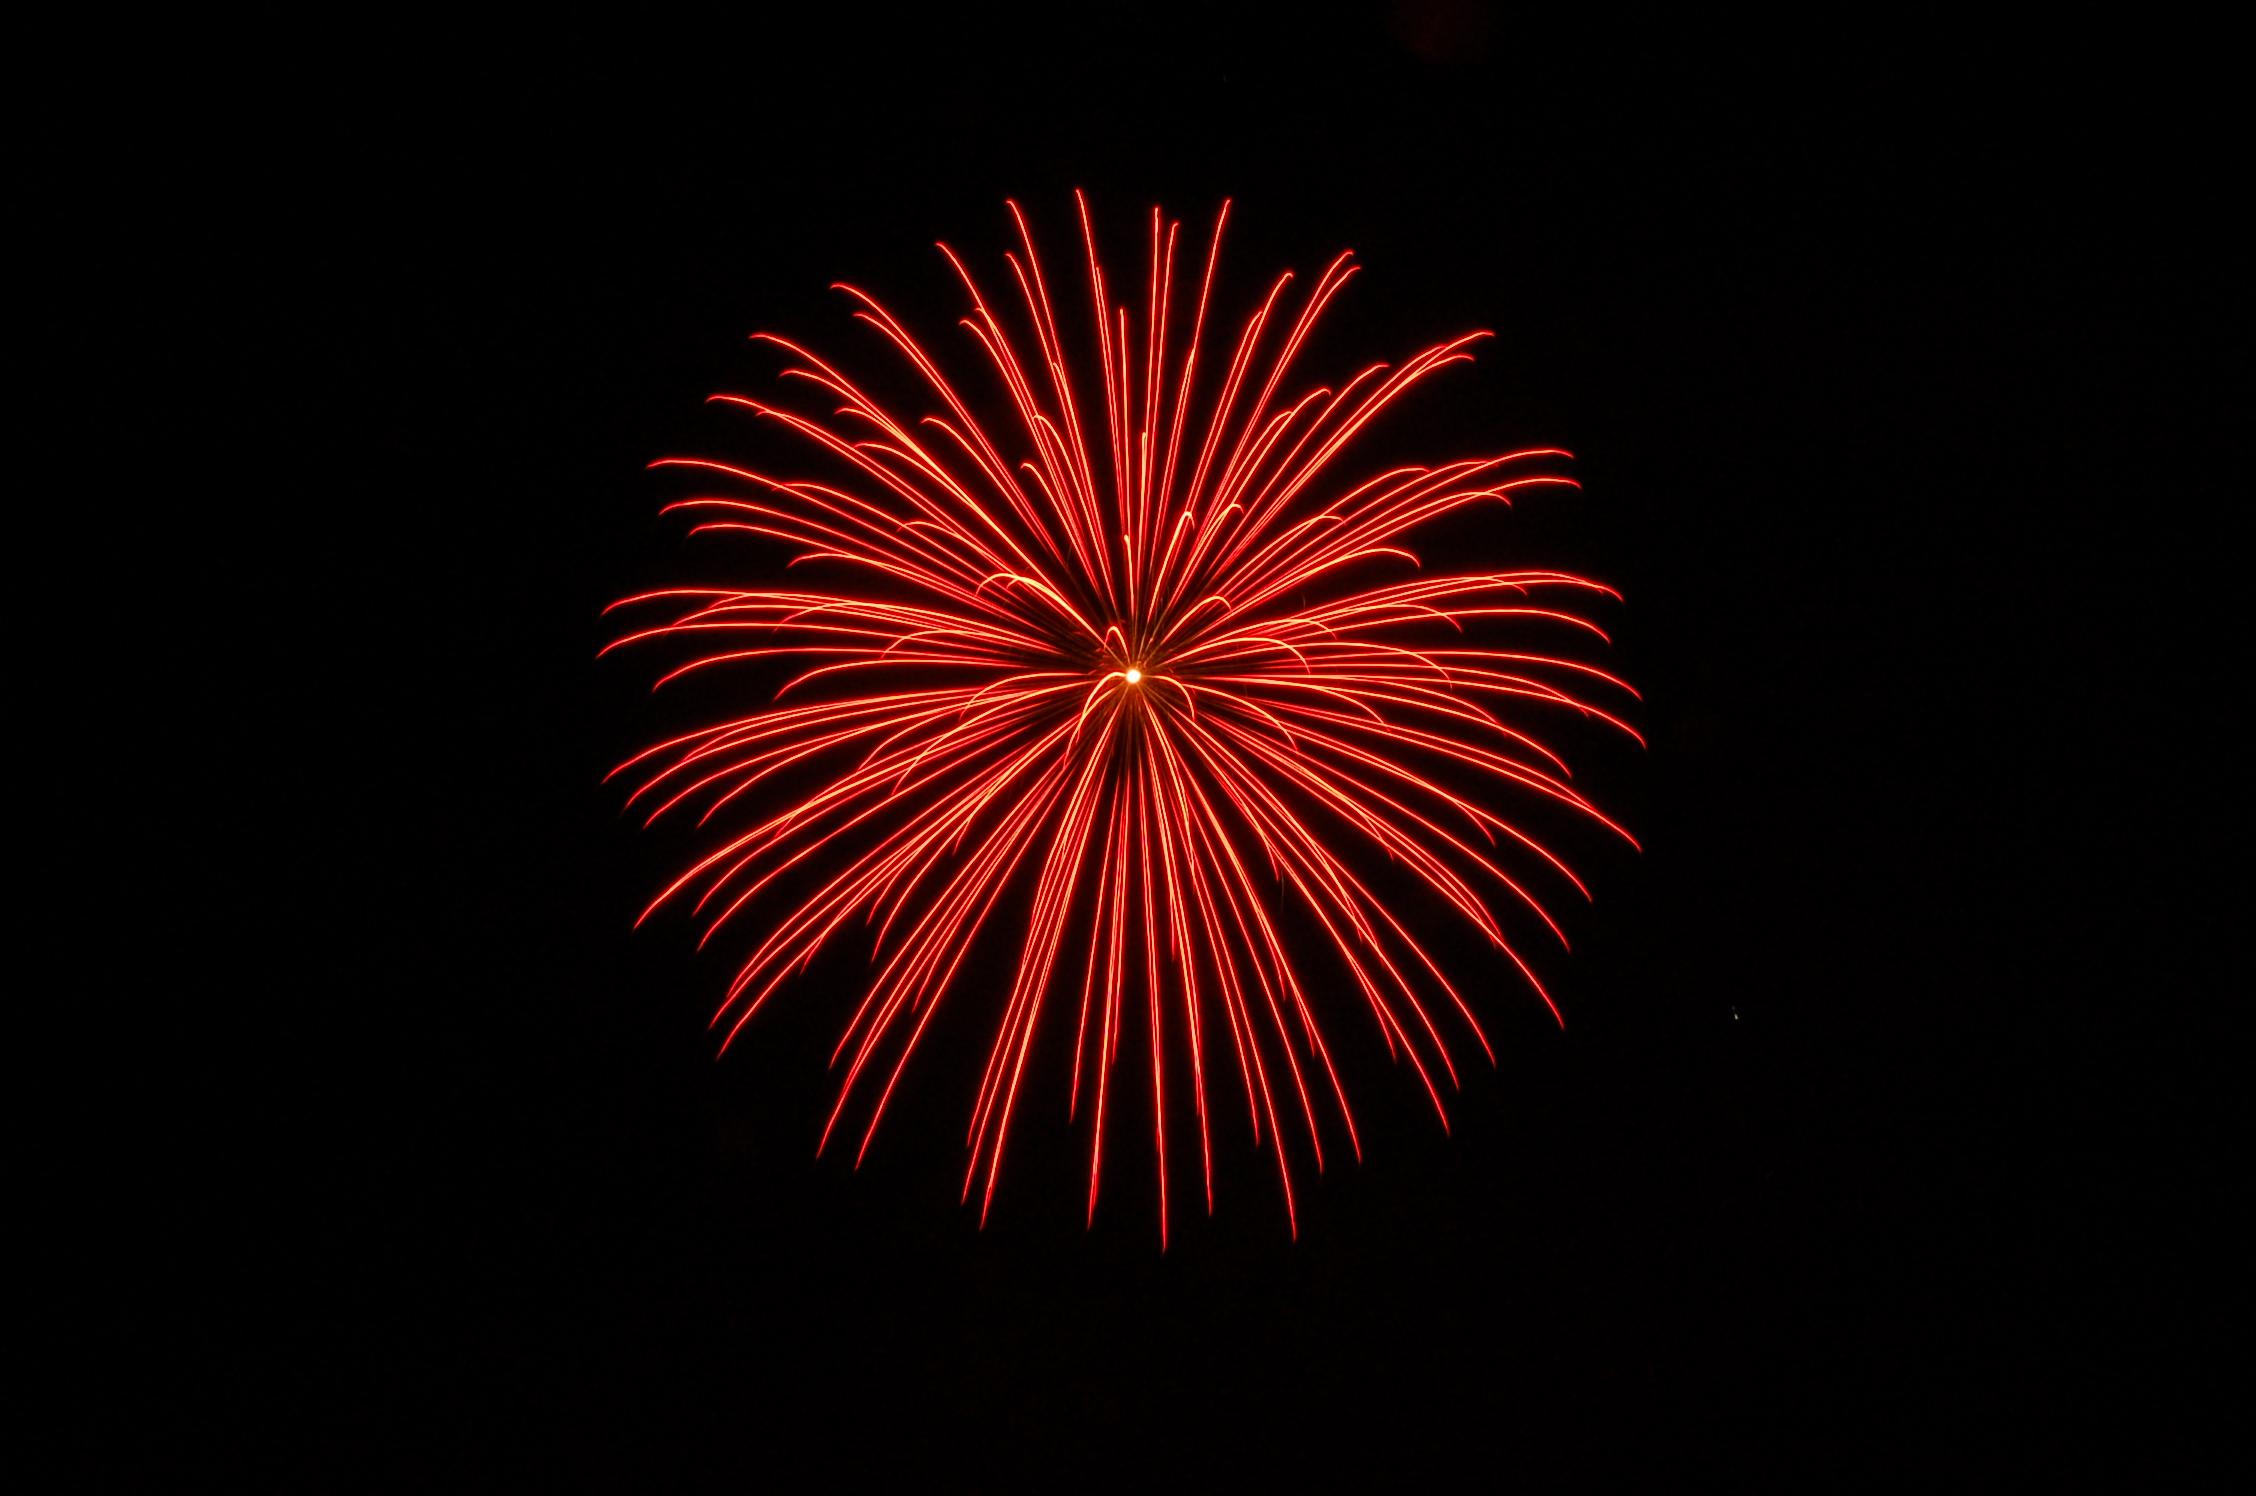 FA_Fireworks_Fireworks032.JPG